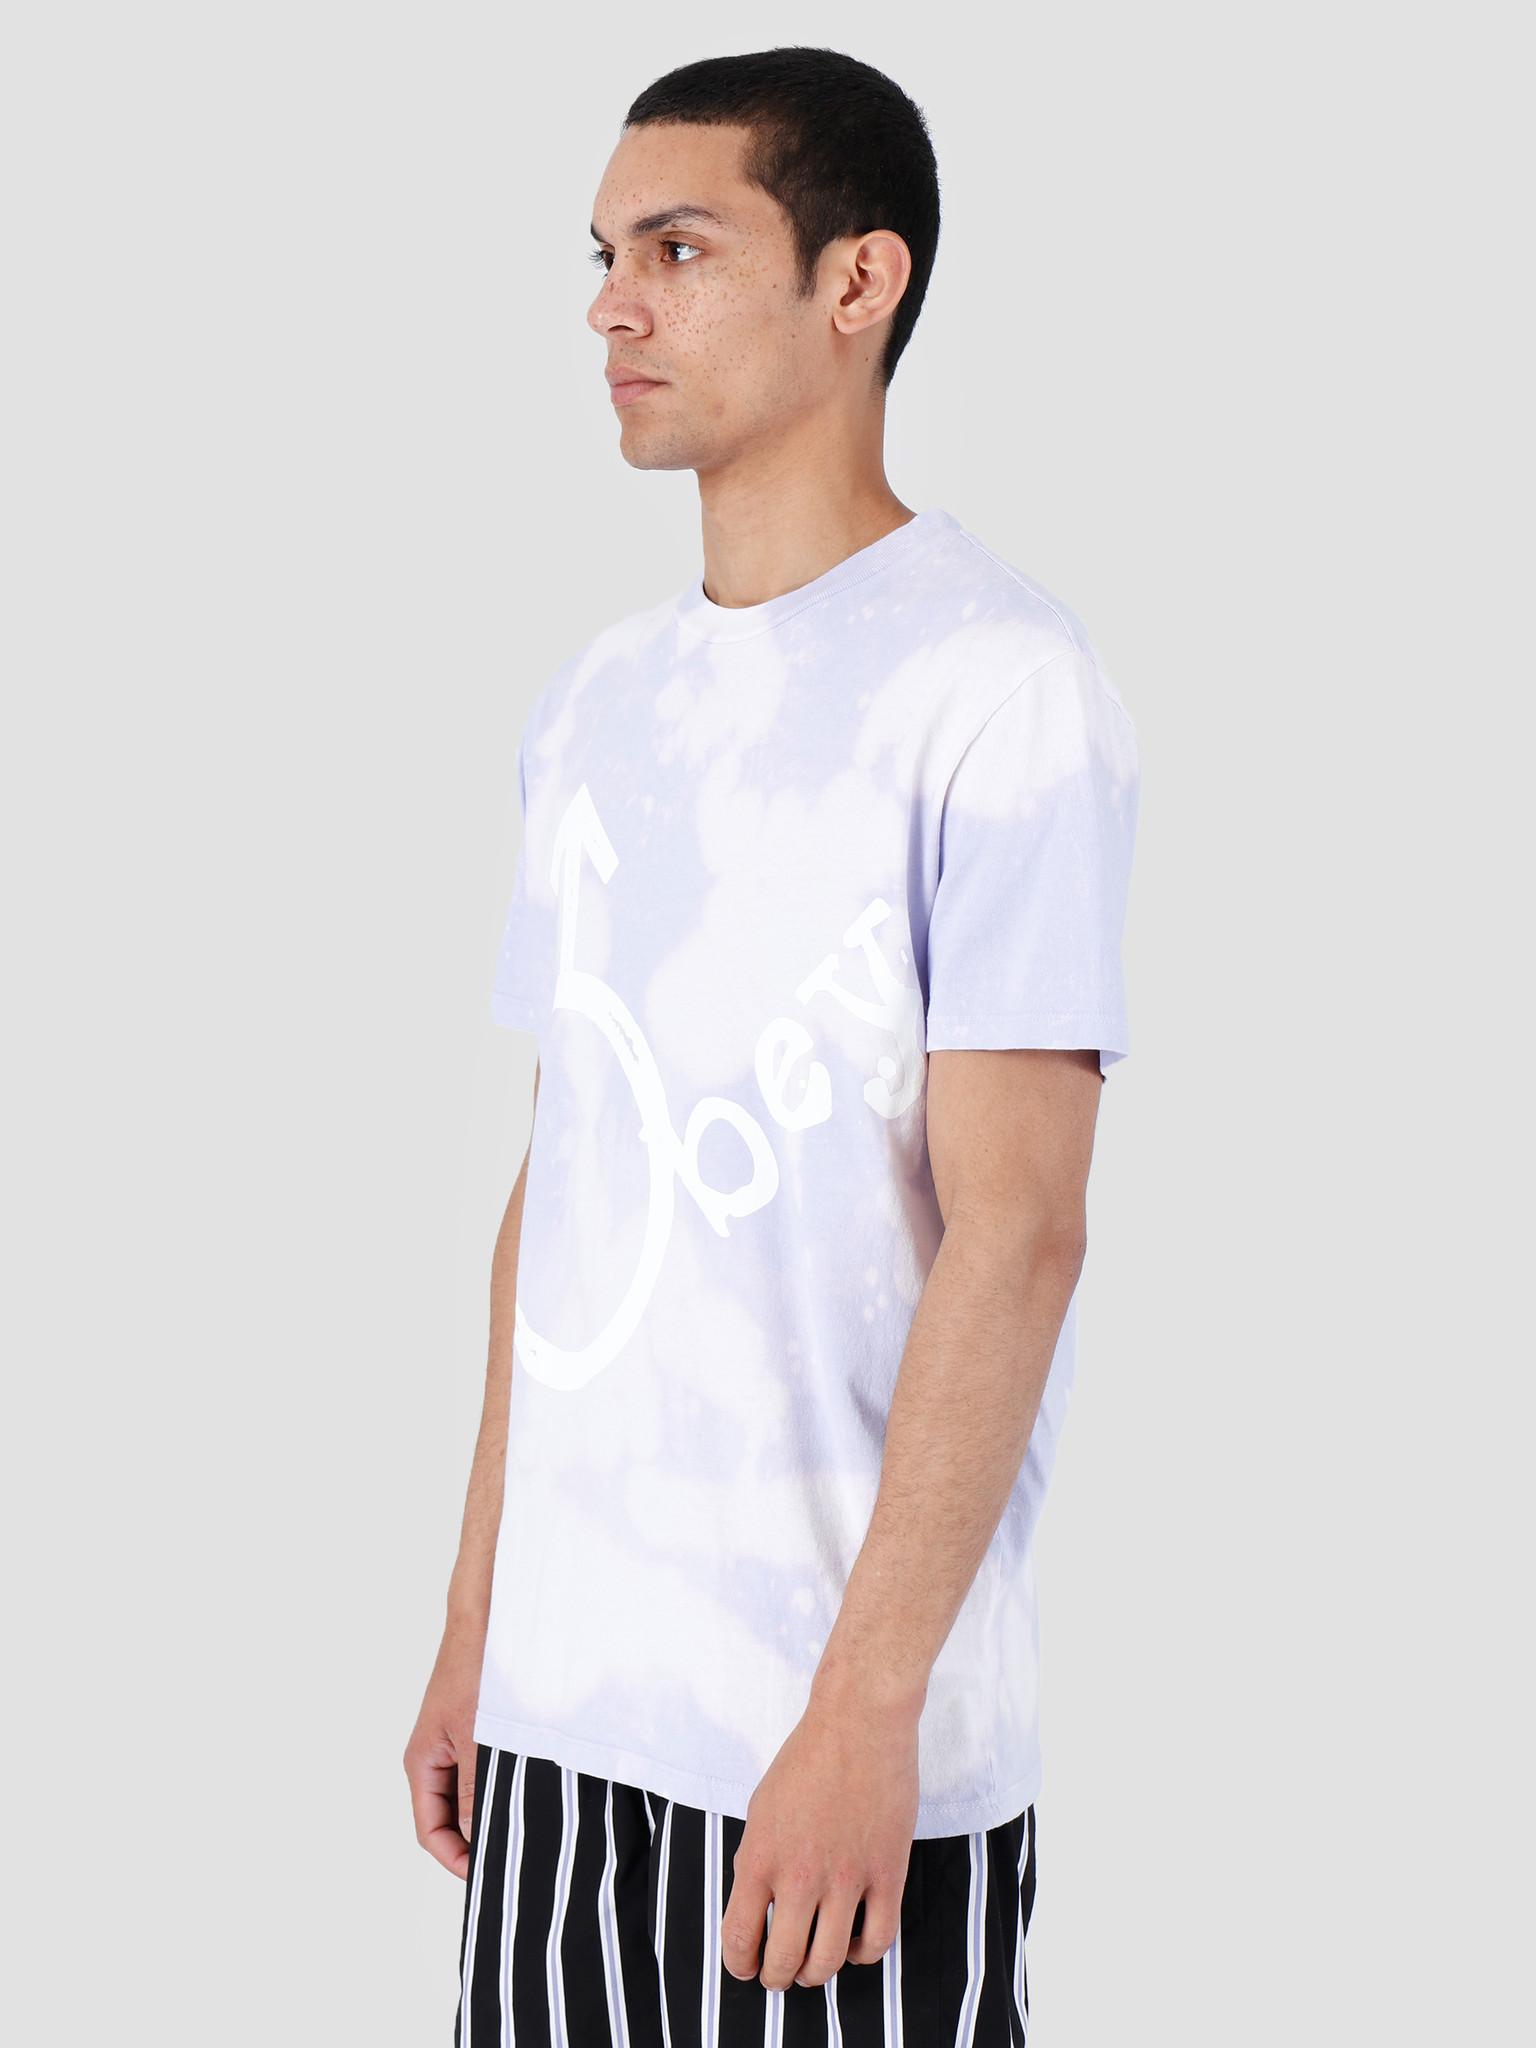 Obey Obey Chrome Bleach T-Shirt Lavender 166741972-LAV